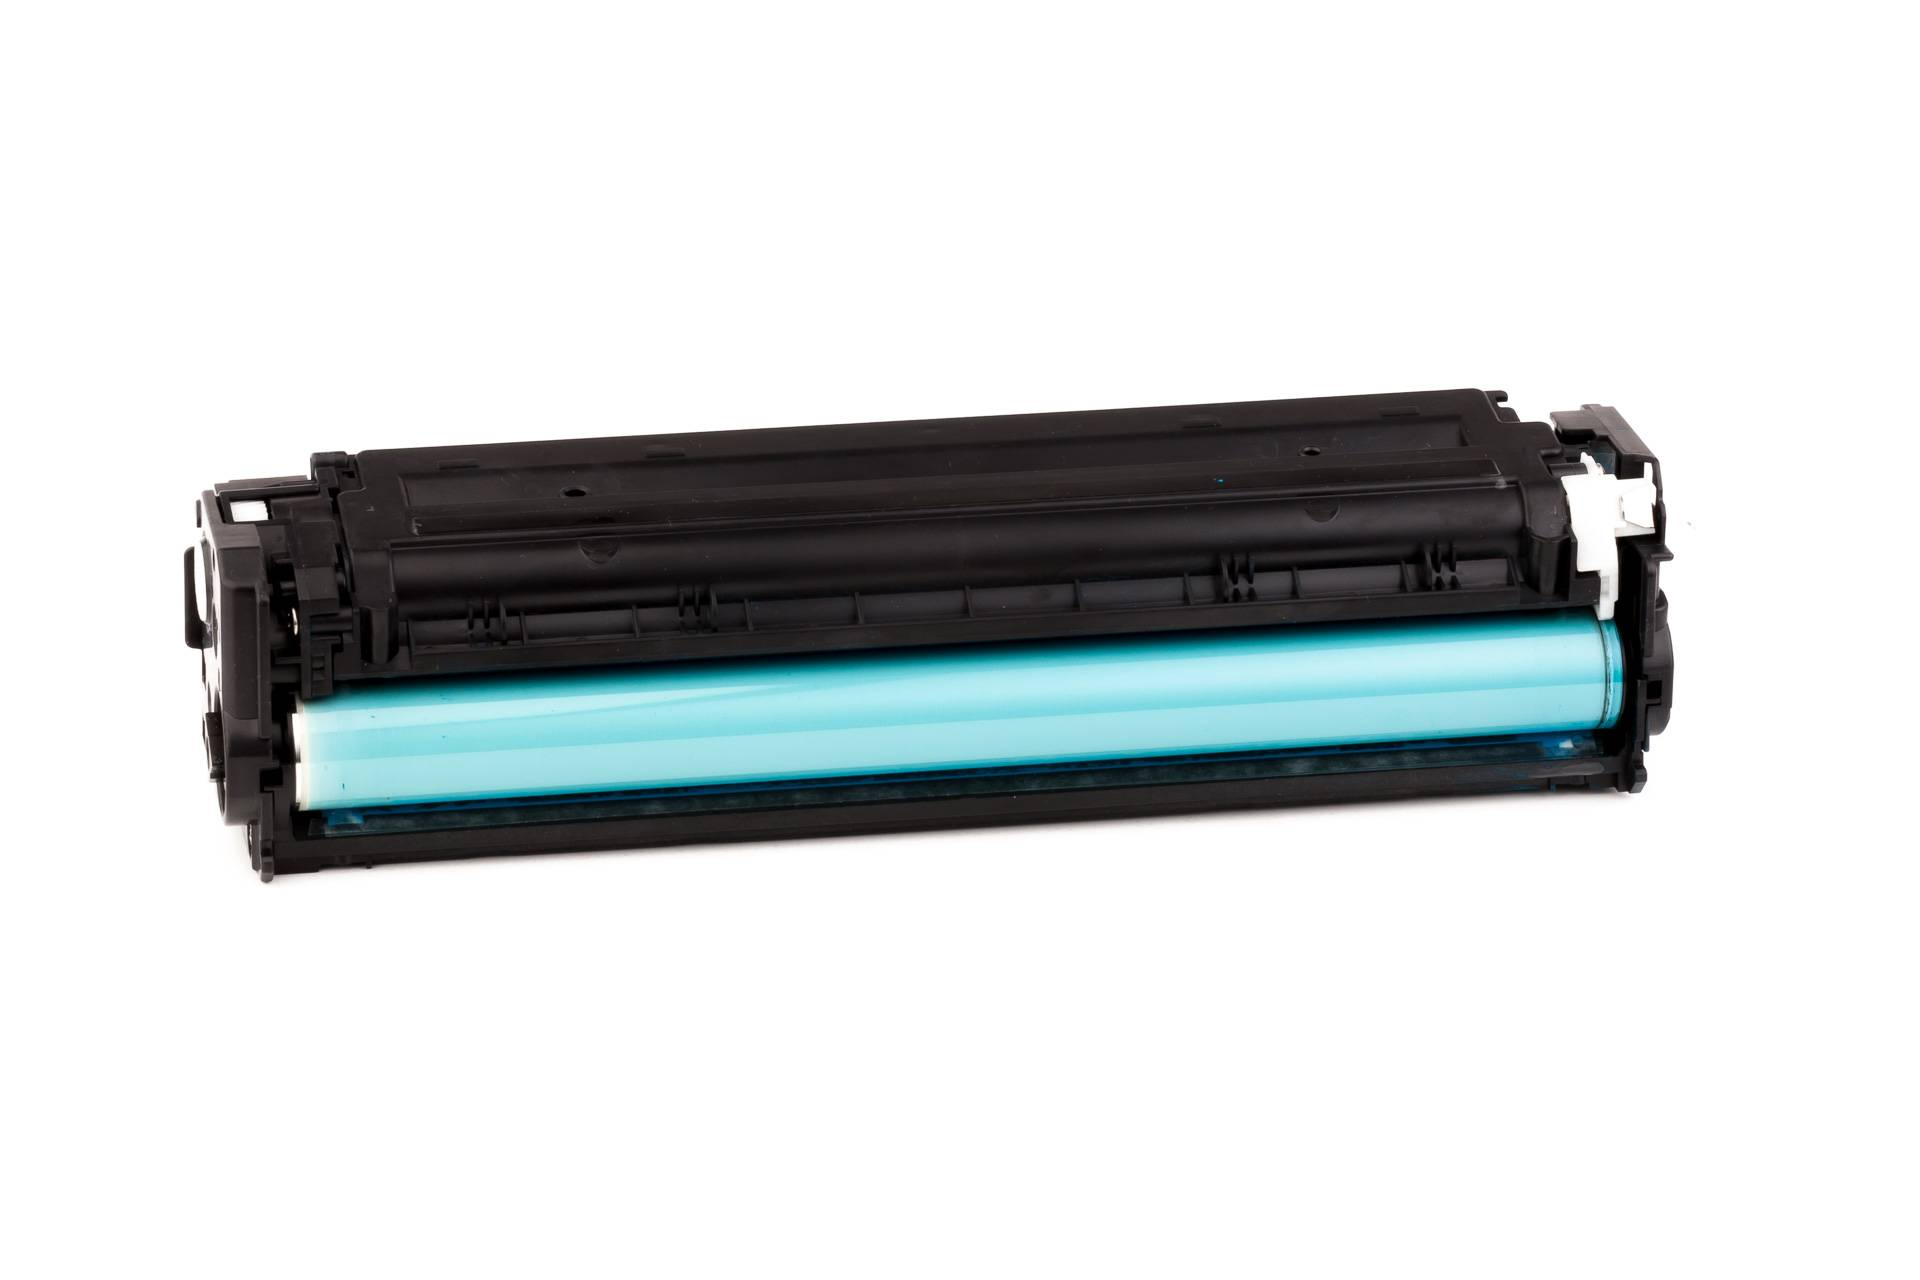 HP Cartouche de Toner pour HP CF211A / 131A cyan compatible (de marque ASC)